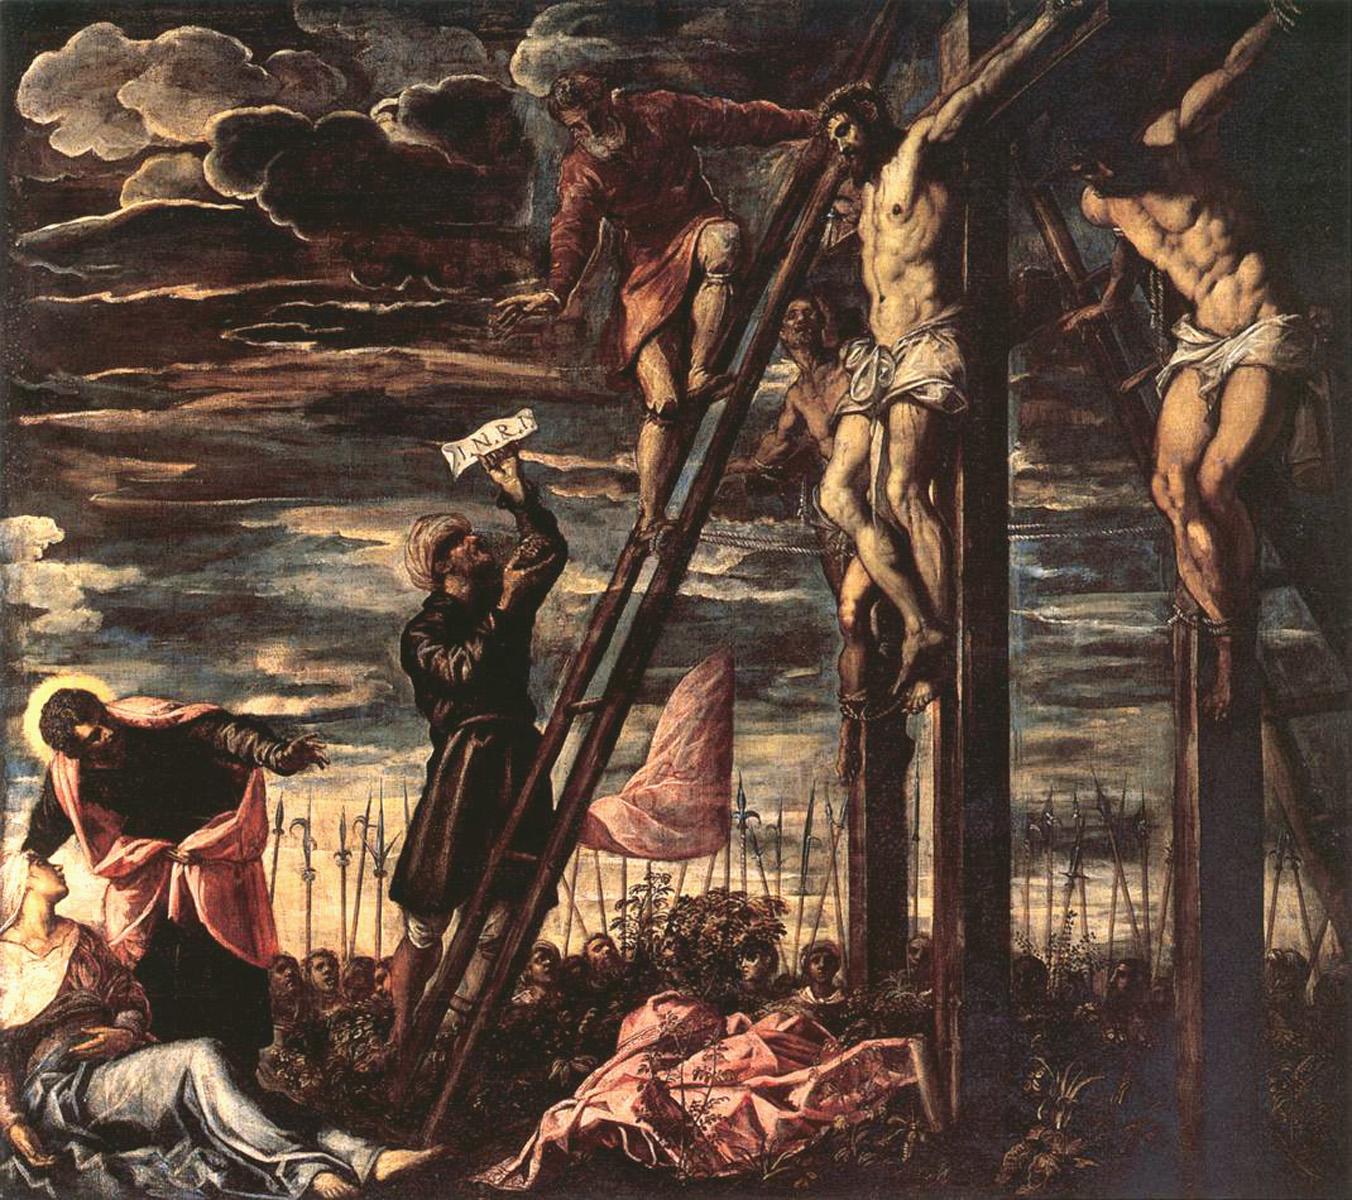 tintoretto-crucifixion2.jpg